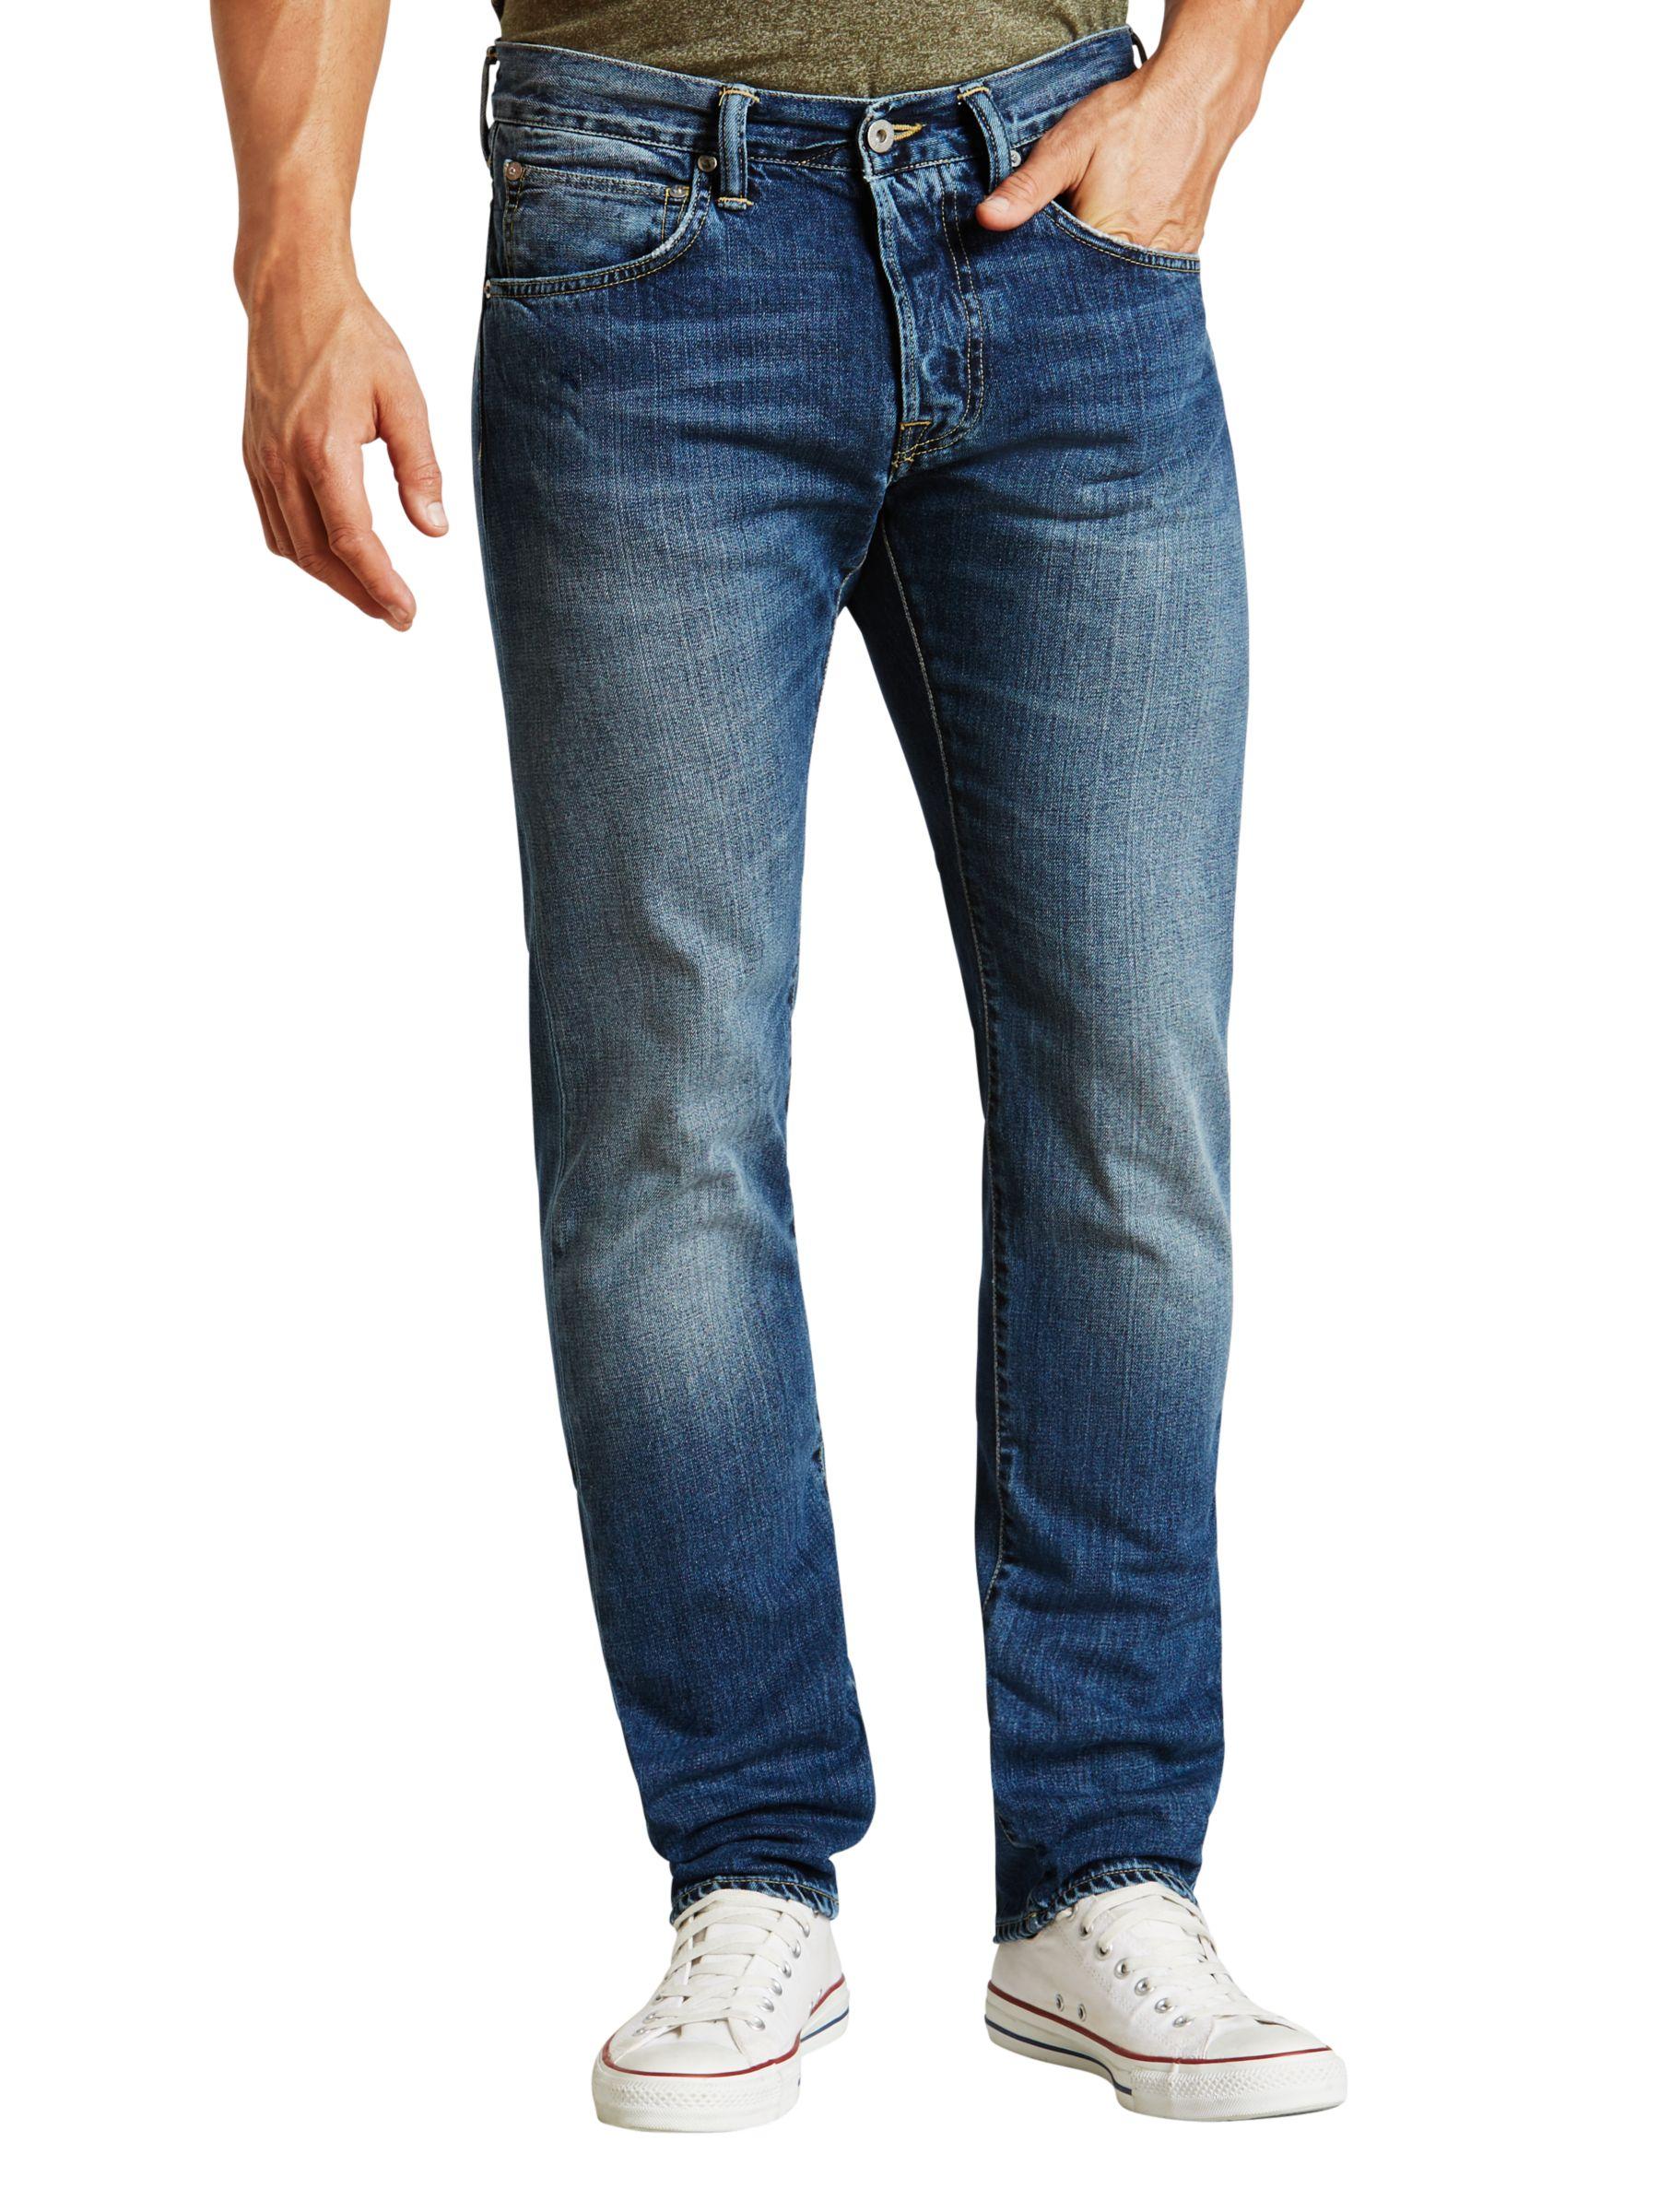 Edwin Edwin Savage Wash Jeans, Savage Wash